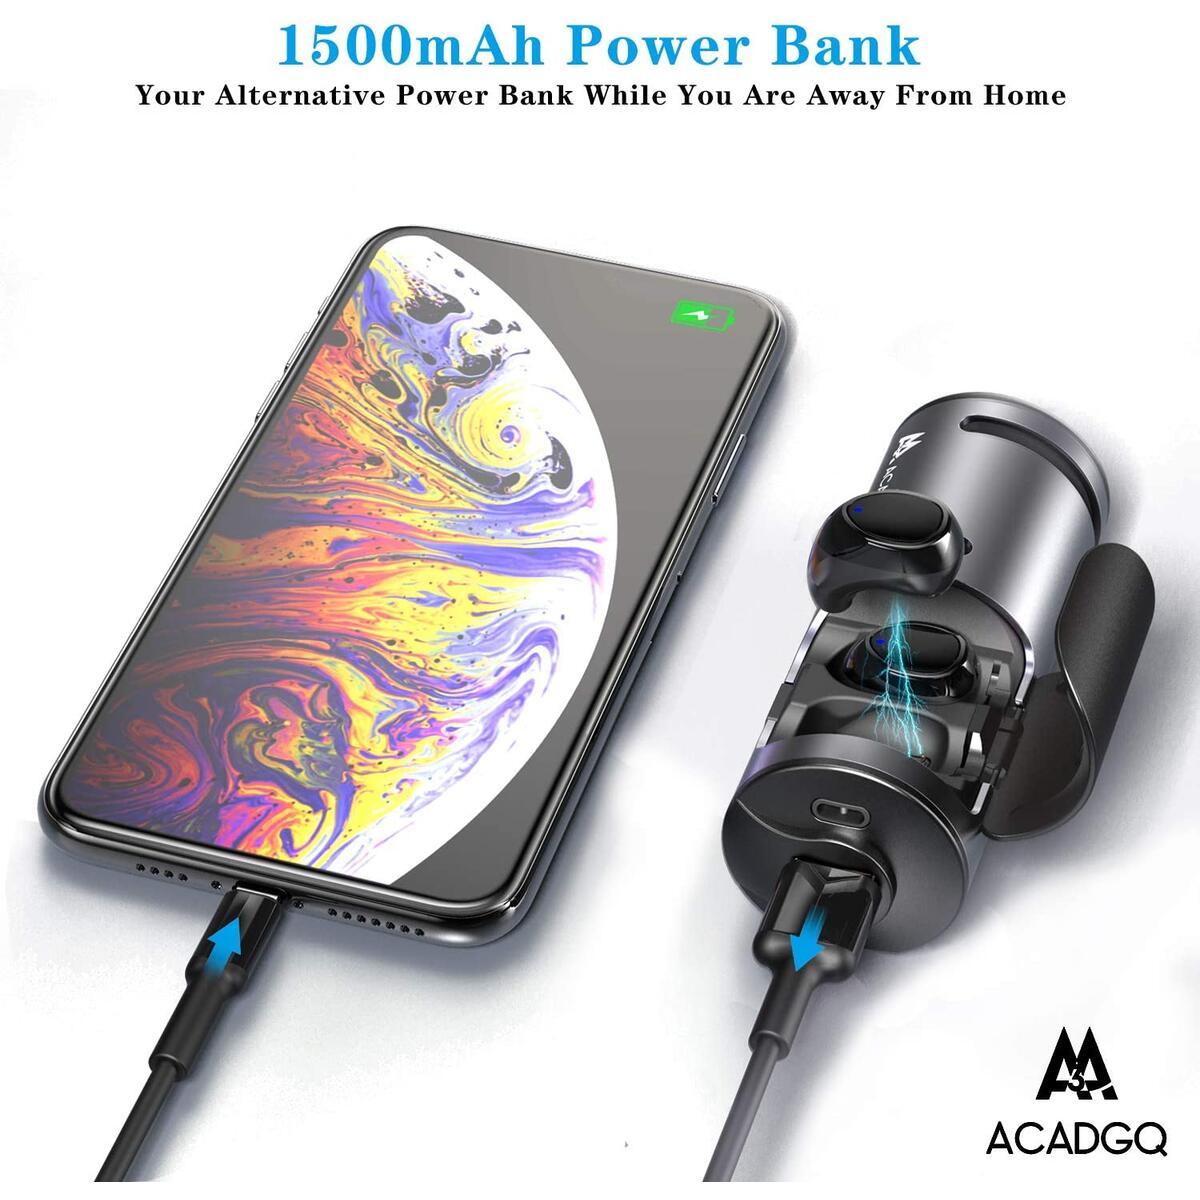 Bluetooth 5.0 Earbuds Rechargeable Wireless Headphones Bluetooth Speaker Waterproof TWS Bluetooth Earphones with Charging Case 3 in 1 Function for Running ACADGQ